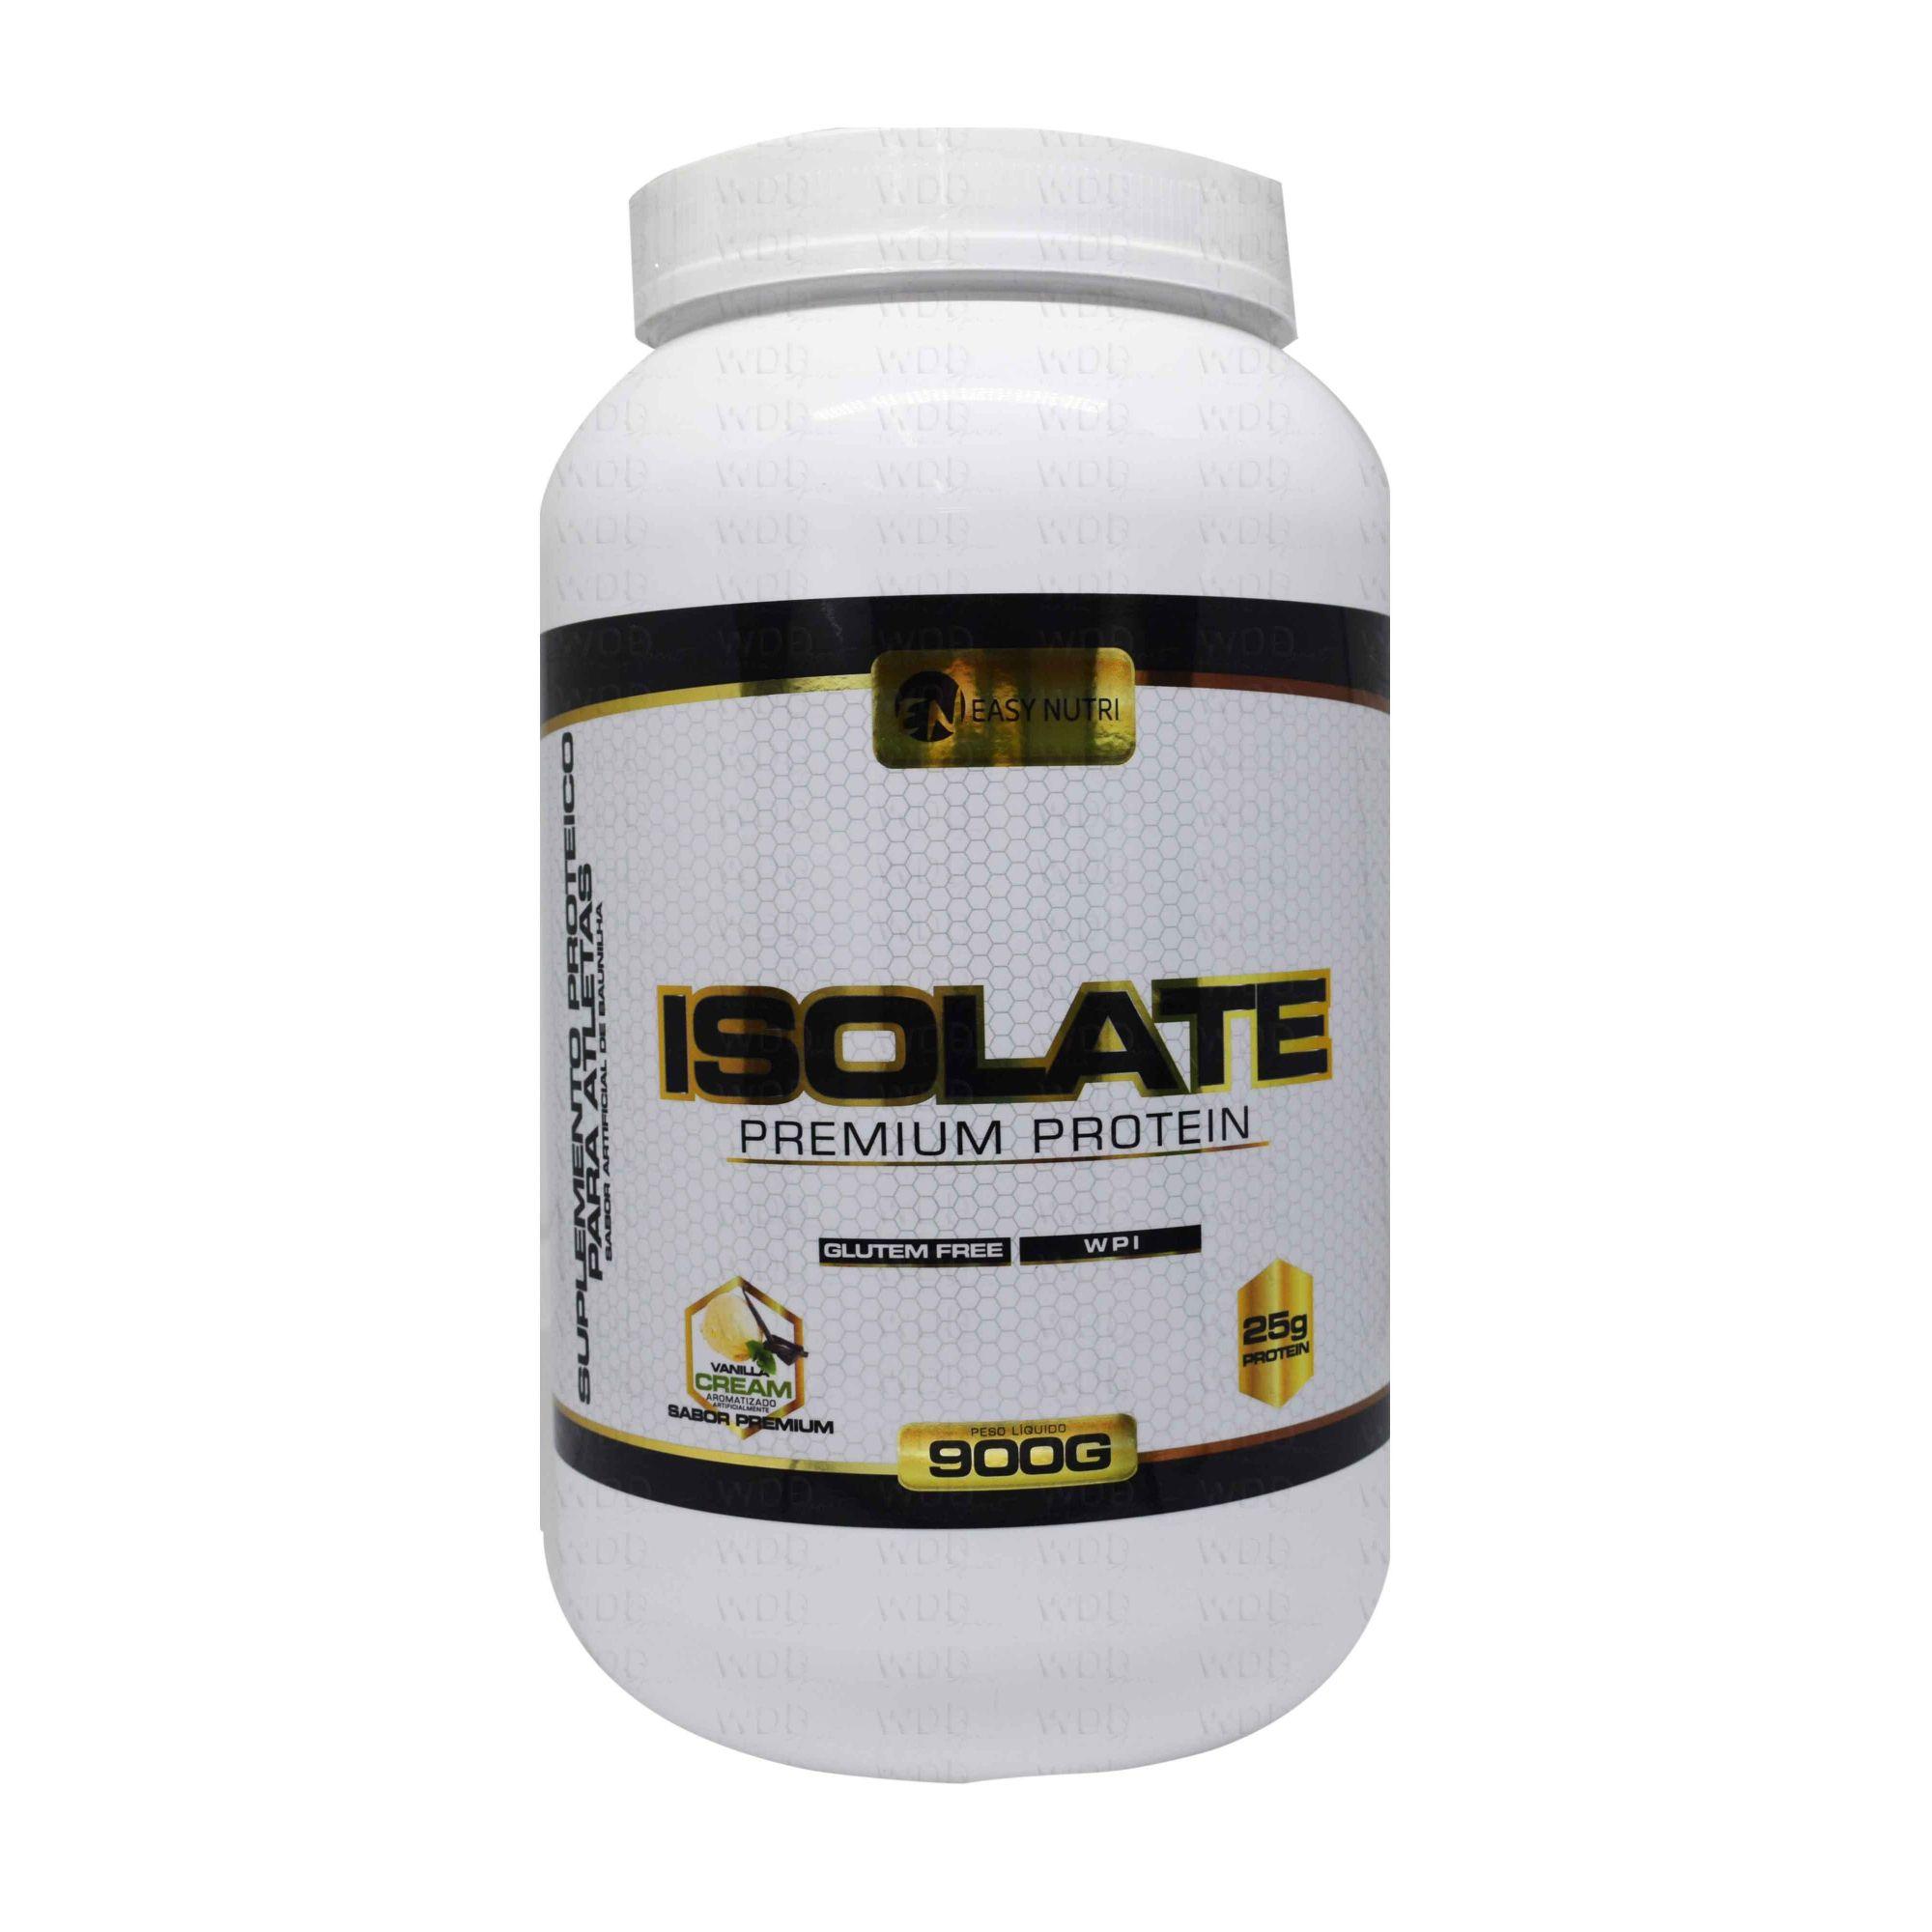 Isolate Premium Protein 900g Easy Nutri